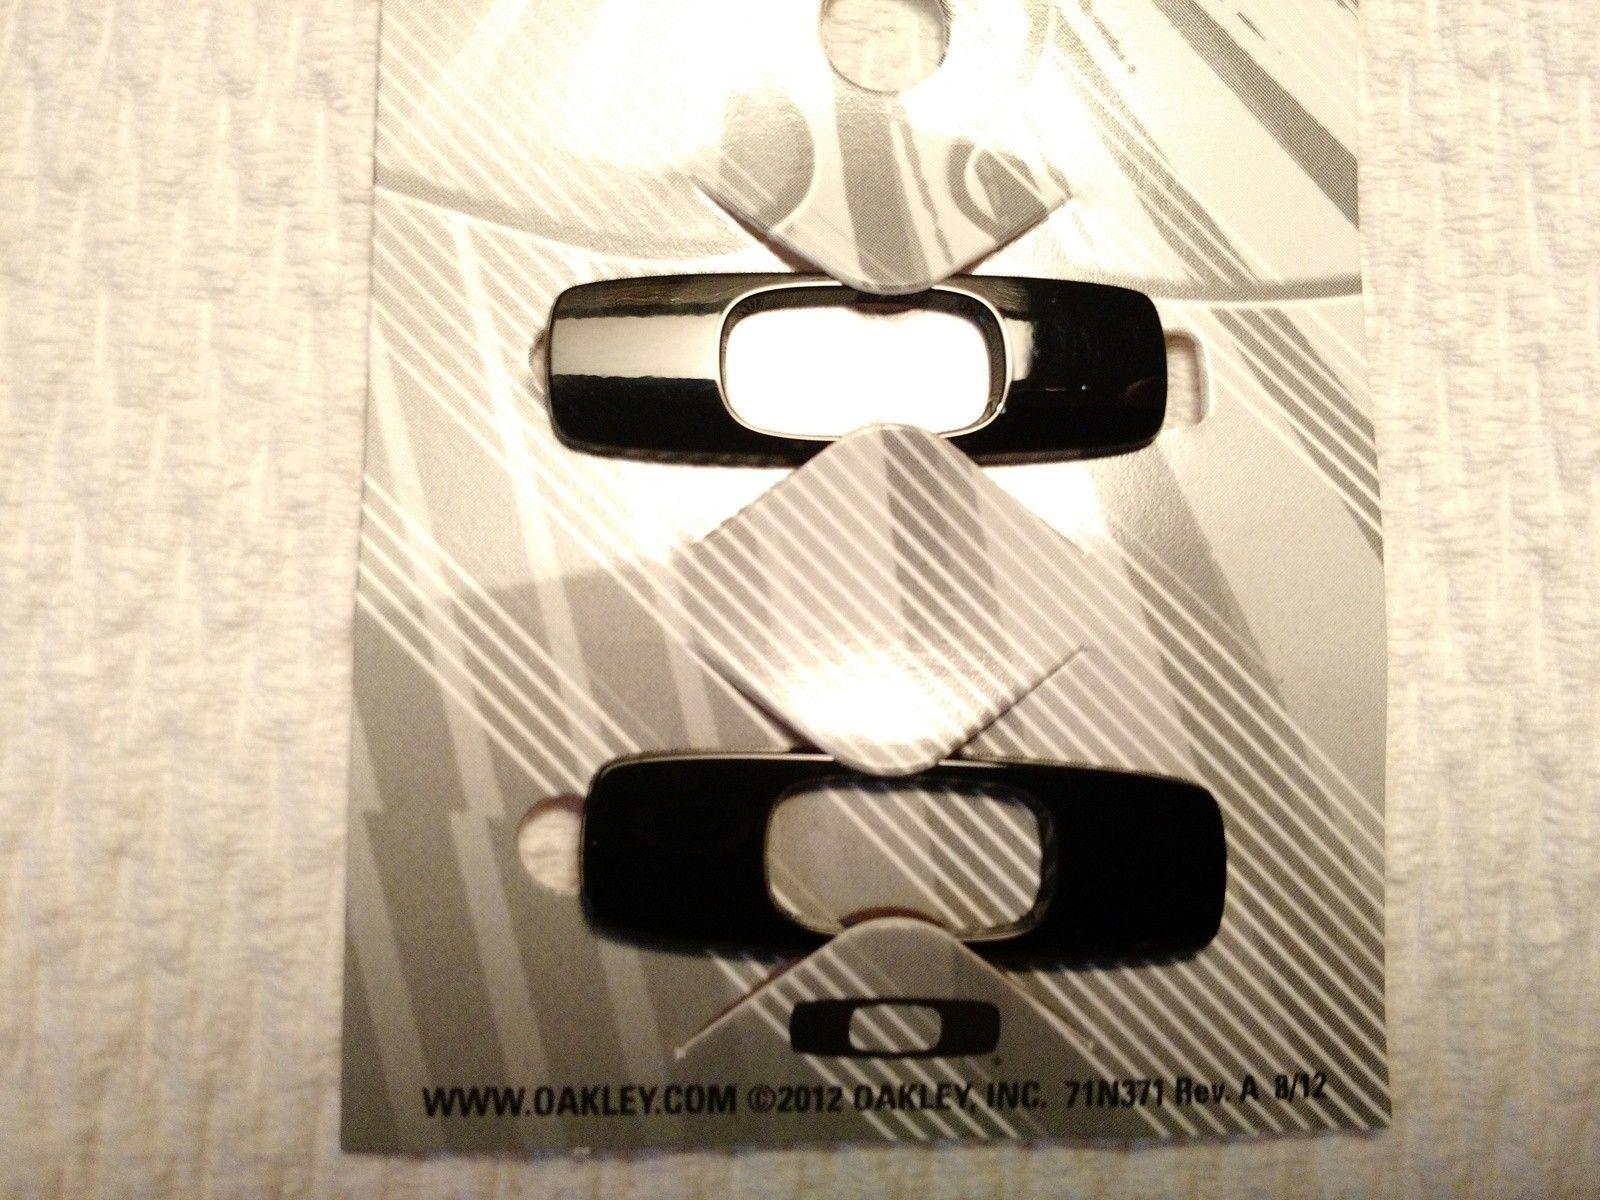 Black Hijinx icons & Fast Jacket persimmon XL lenses - IMG_20150131_234453719.jpg